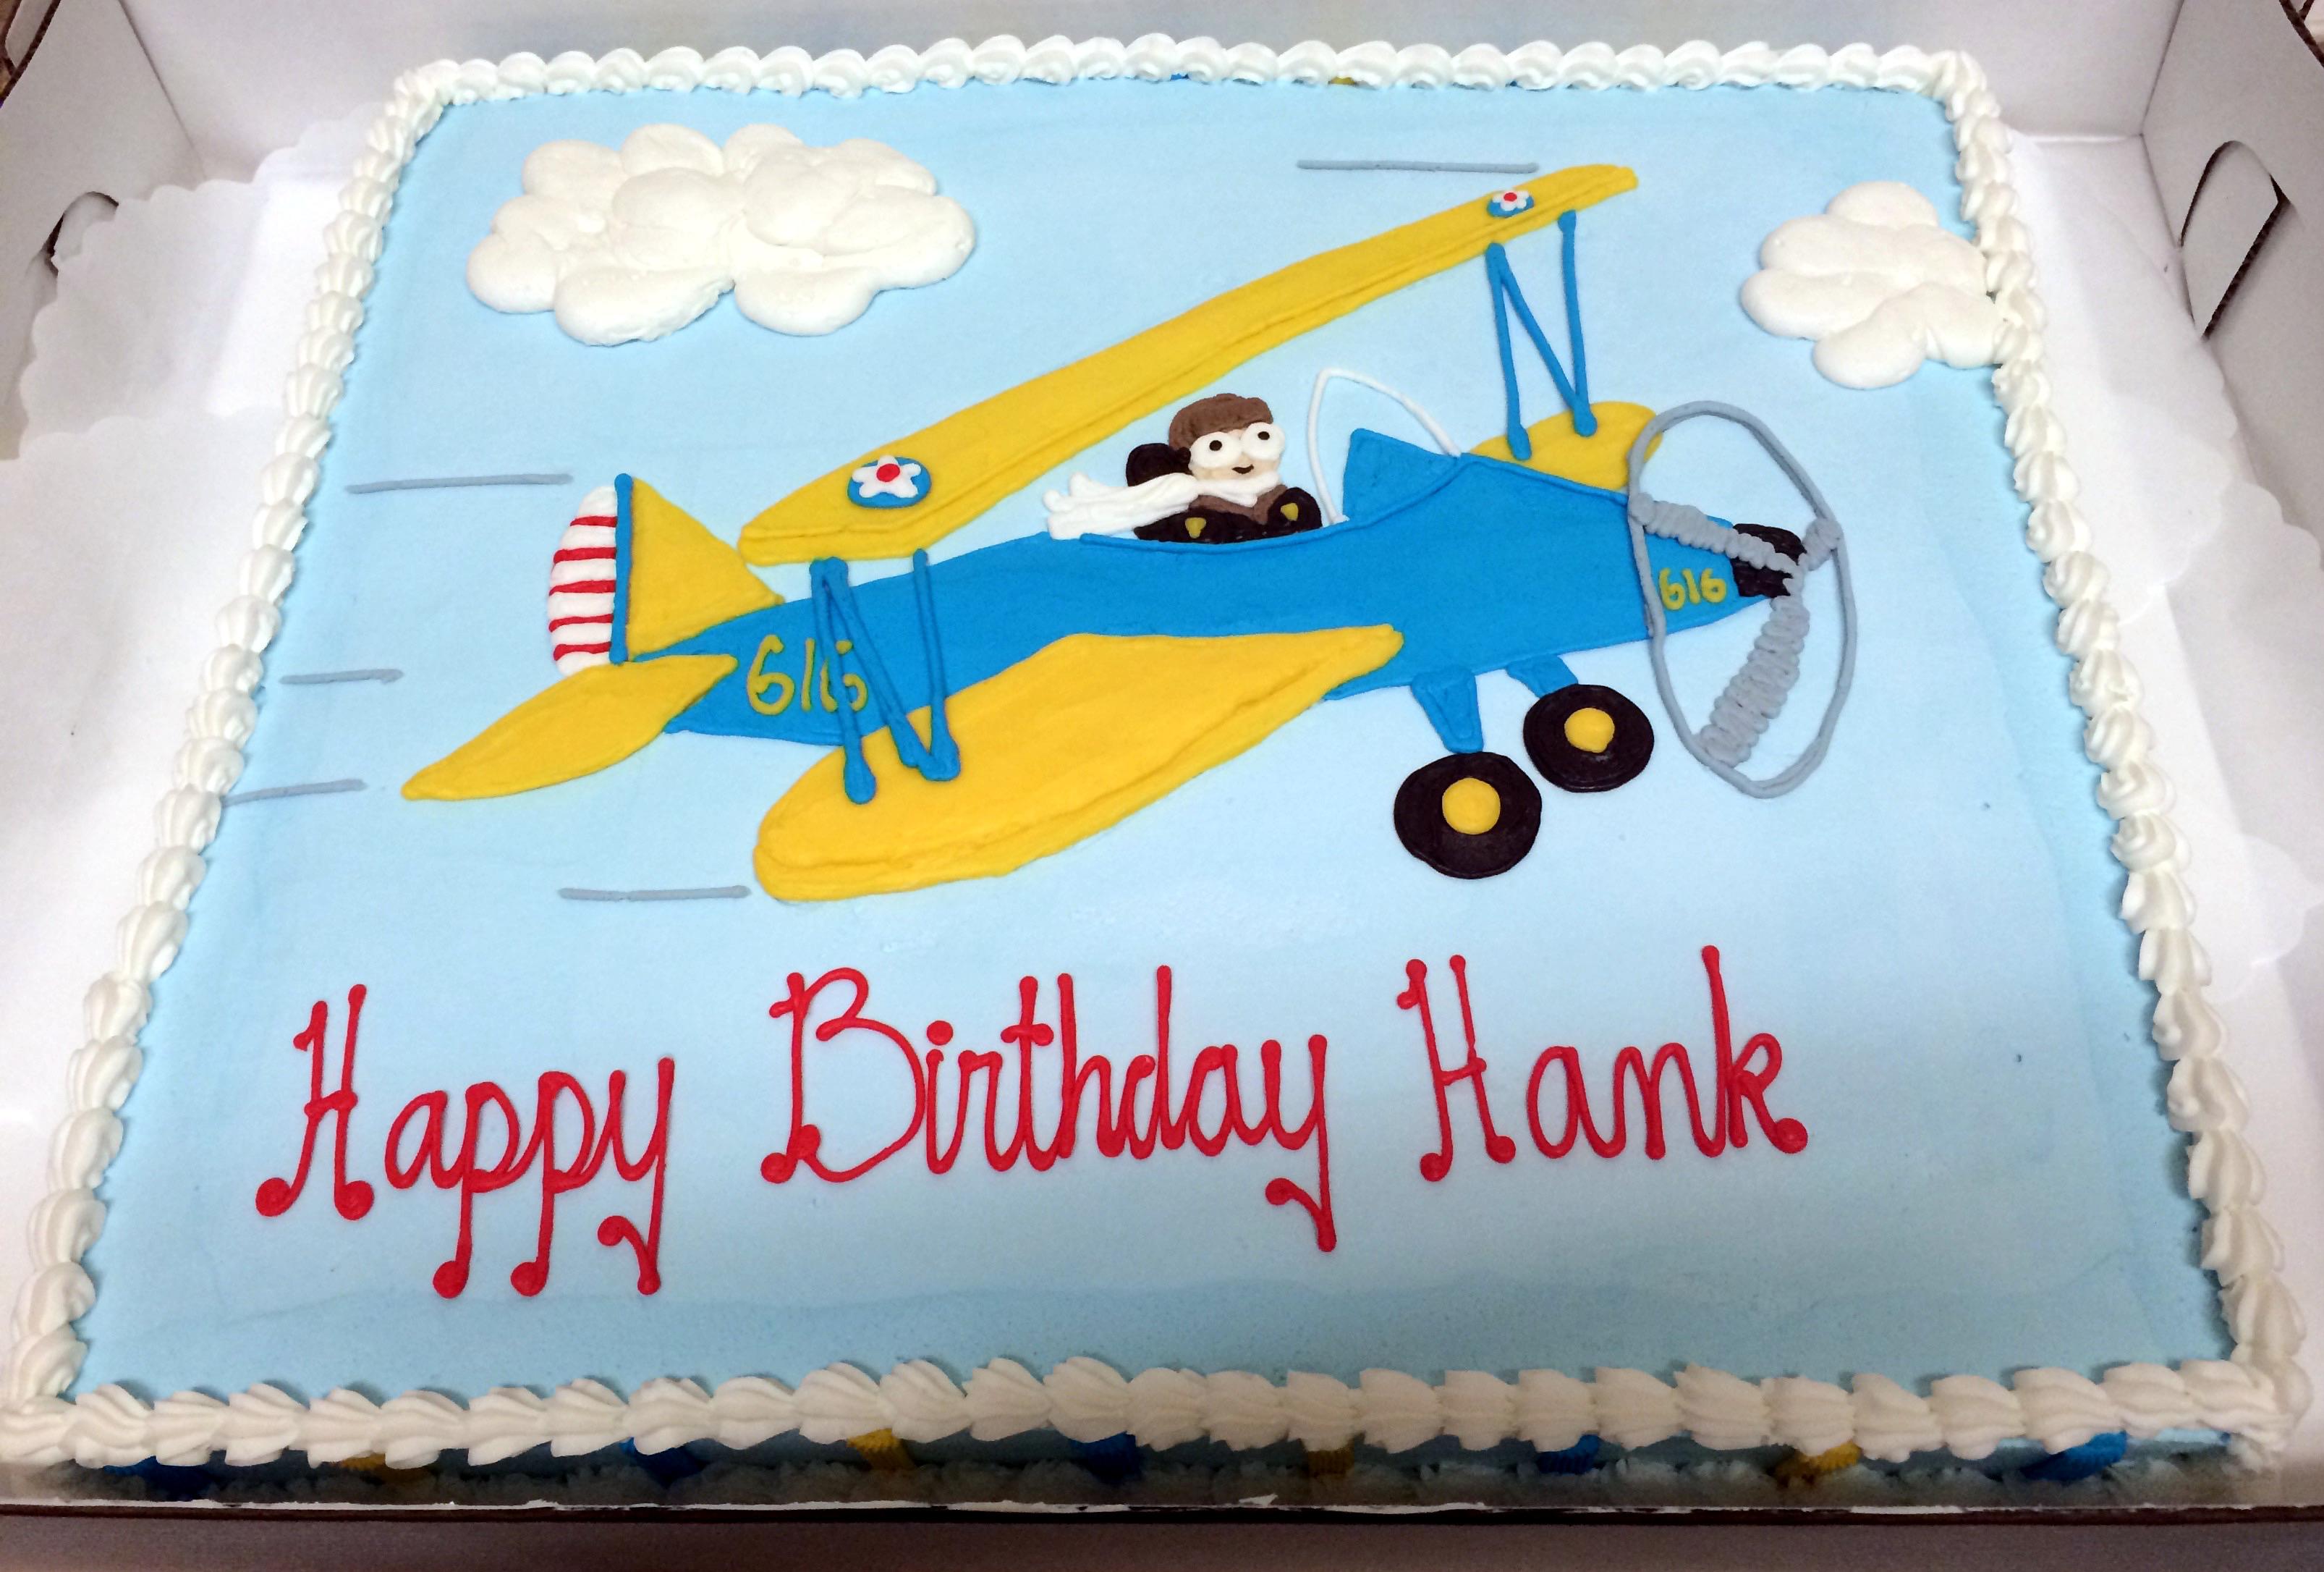 Prop Plane Birthday Cake 50